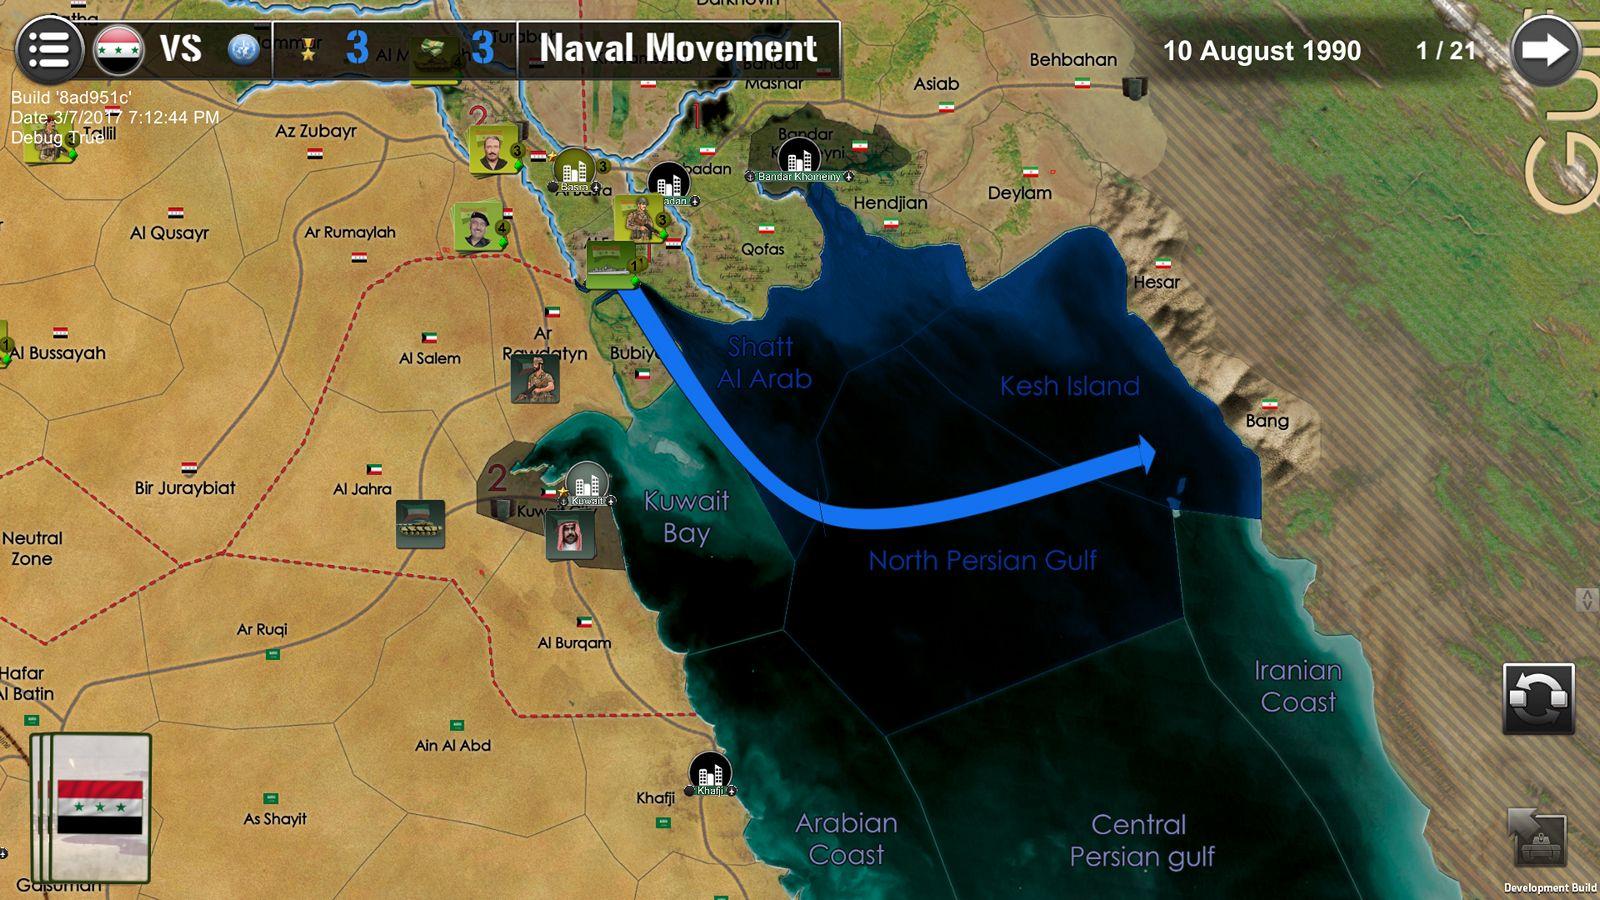 War Across the World Wars-across-the-world-0317-Gulf1990_NavalMovement_Screen2